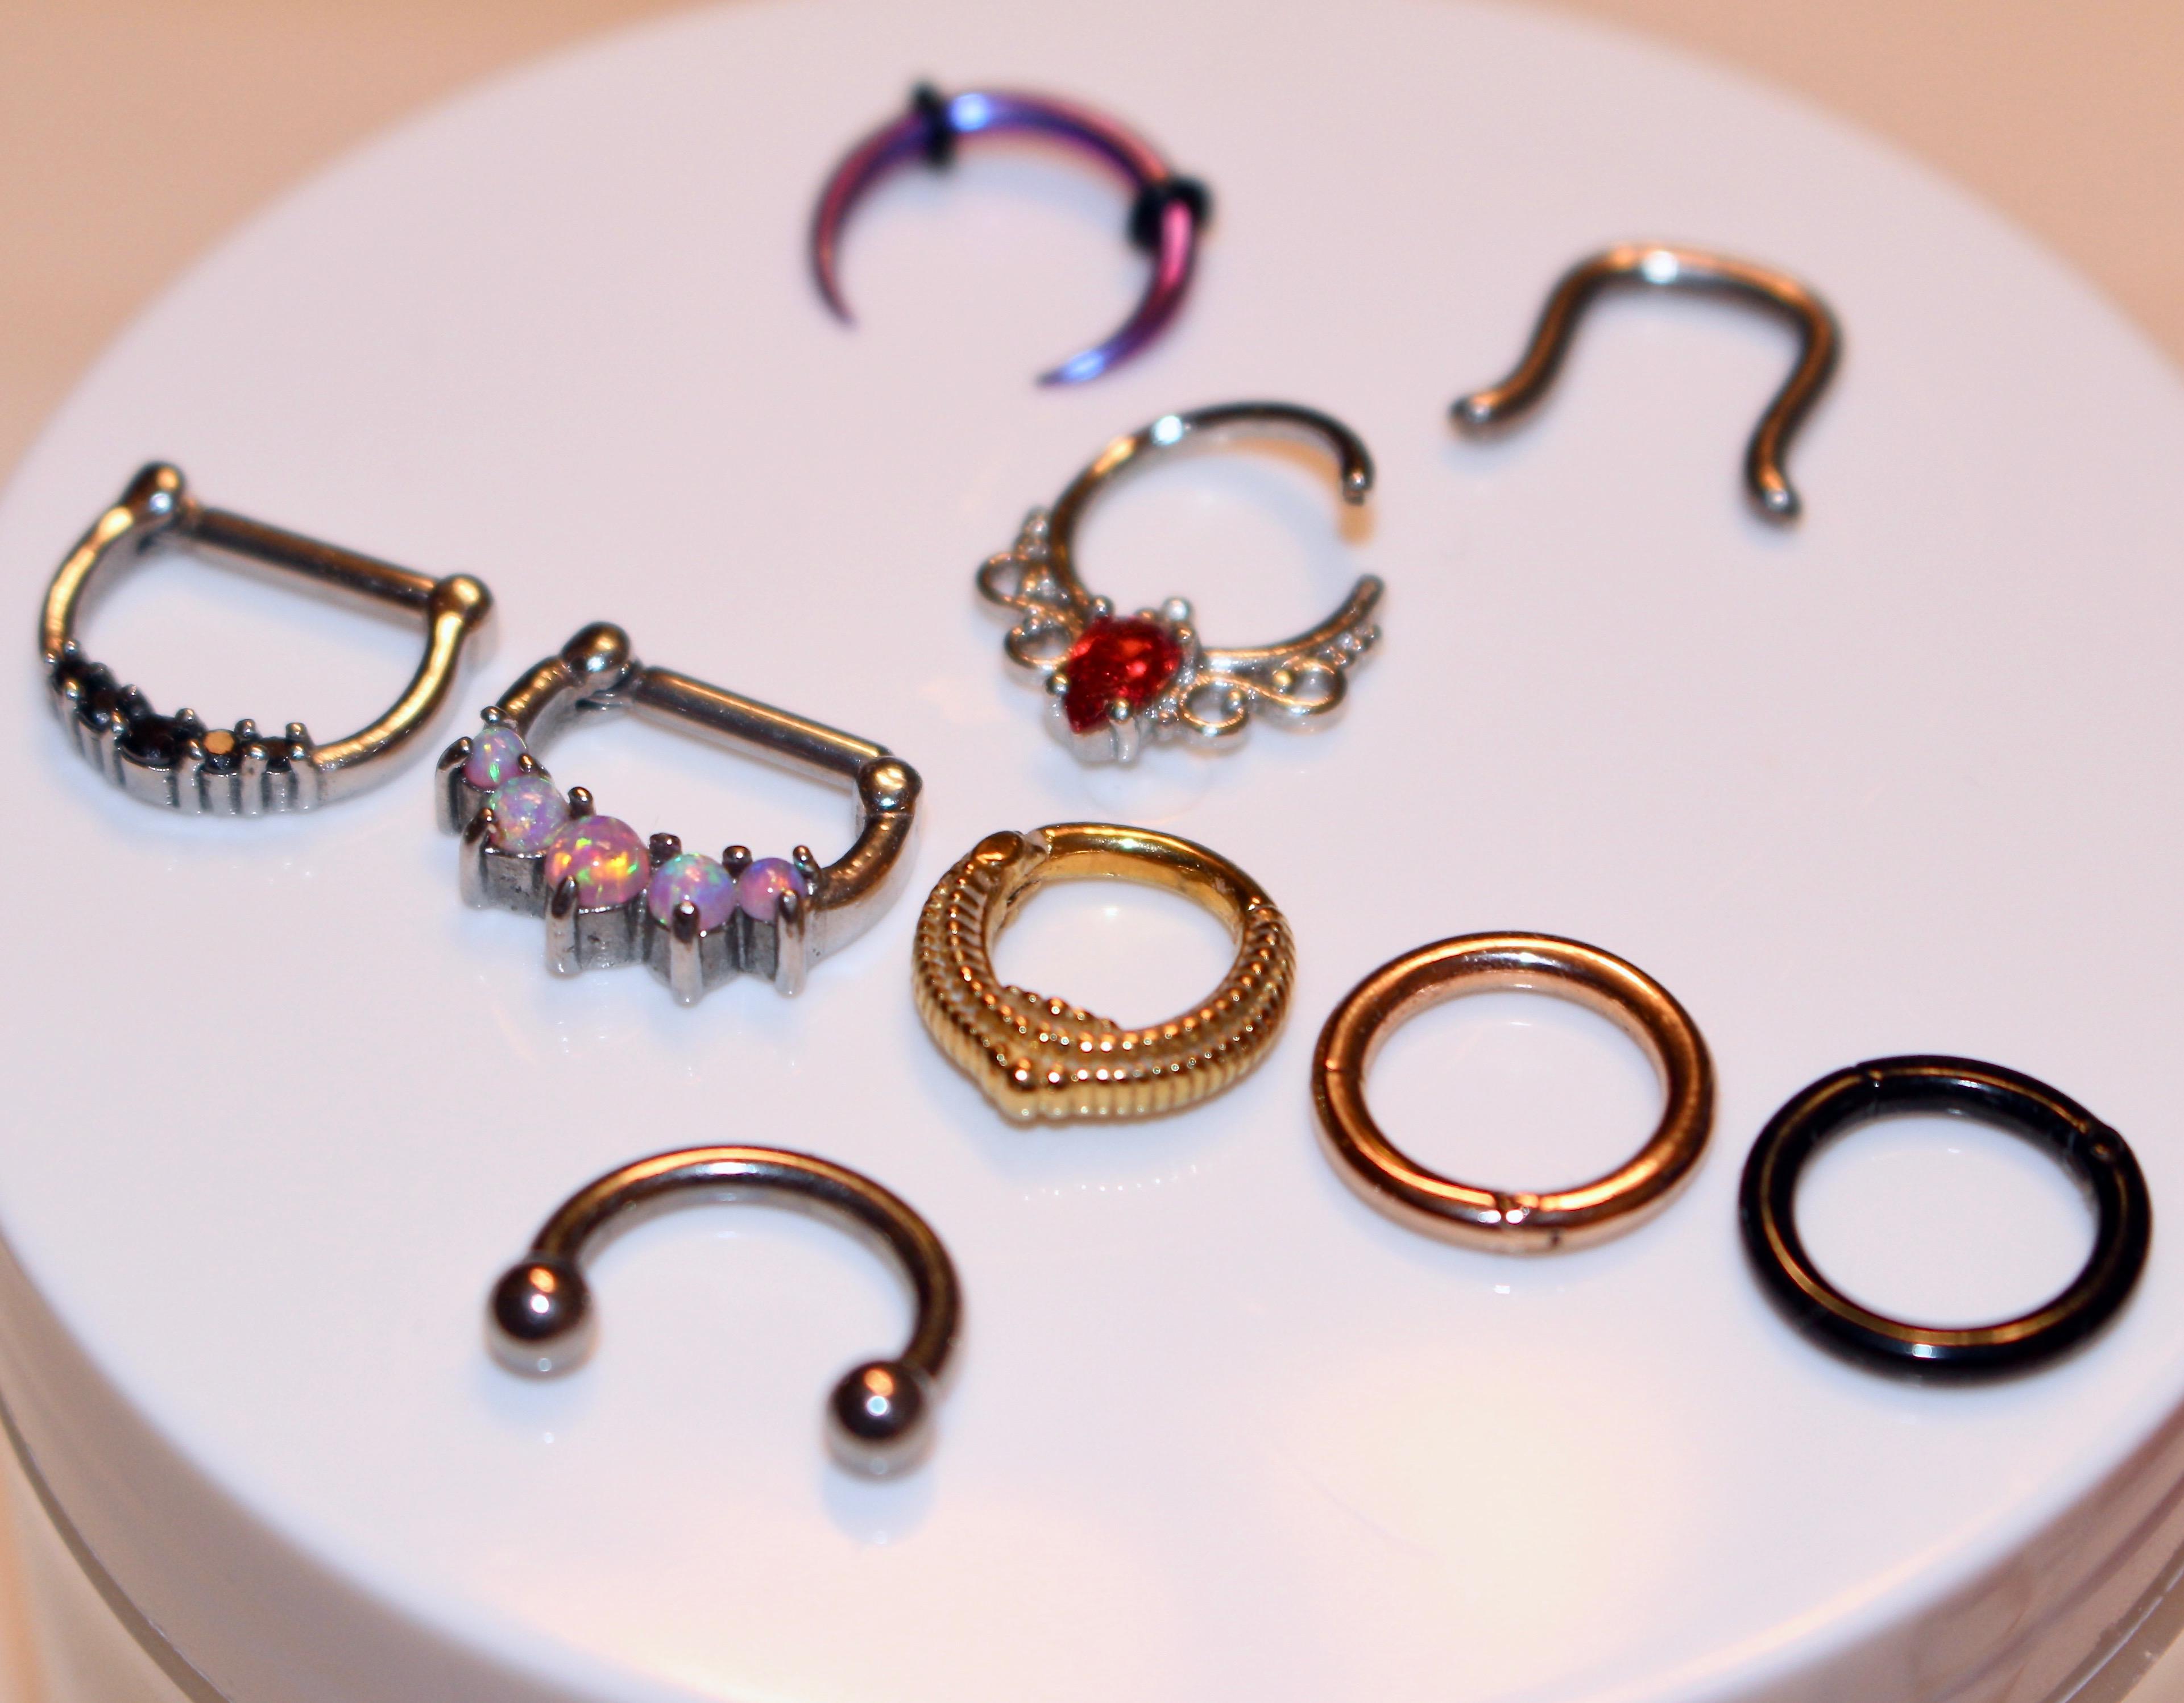 My Septum Jewelry